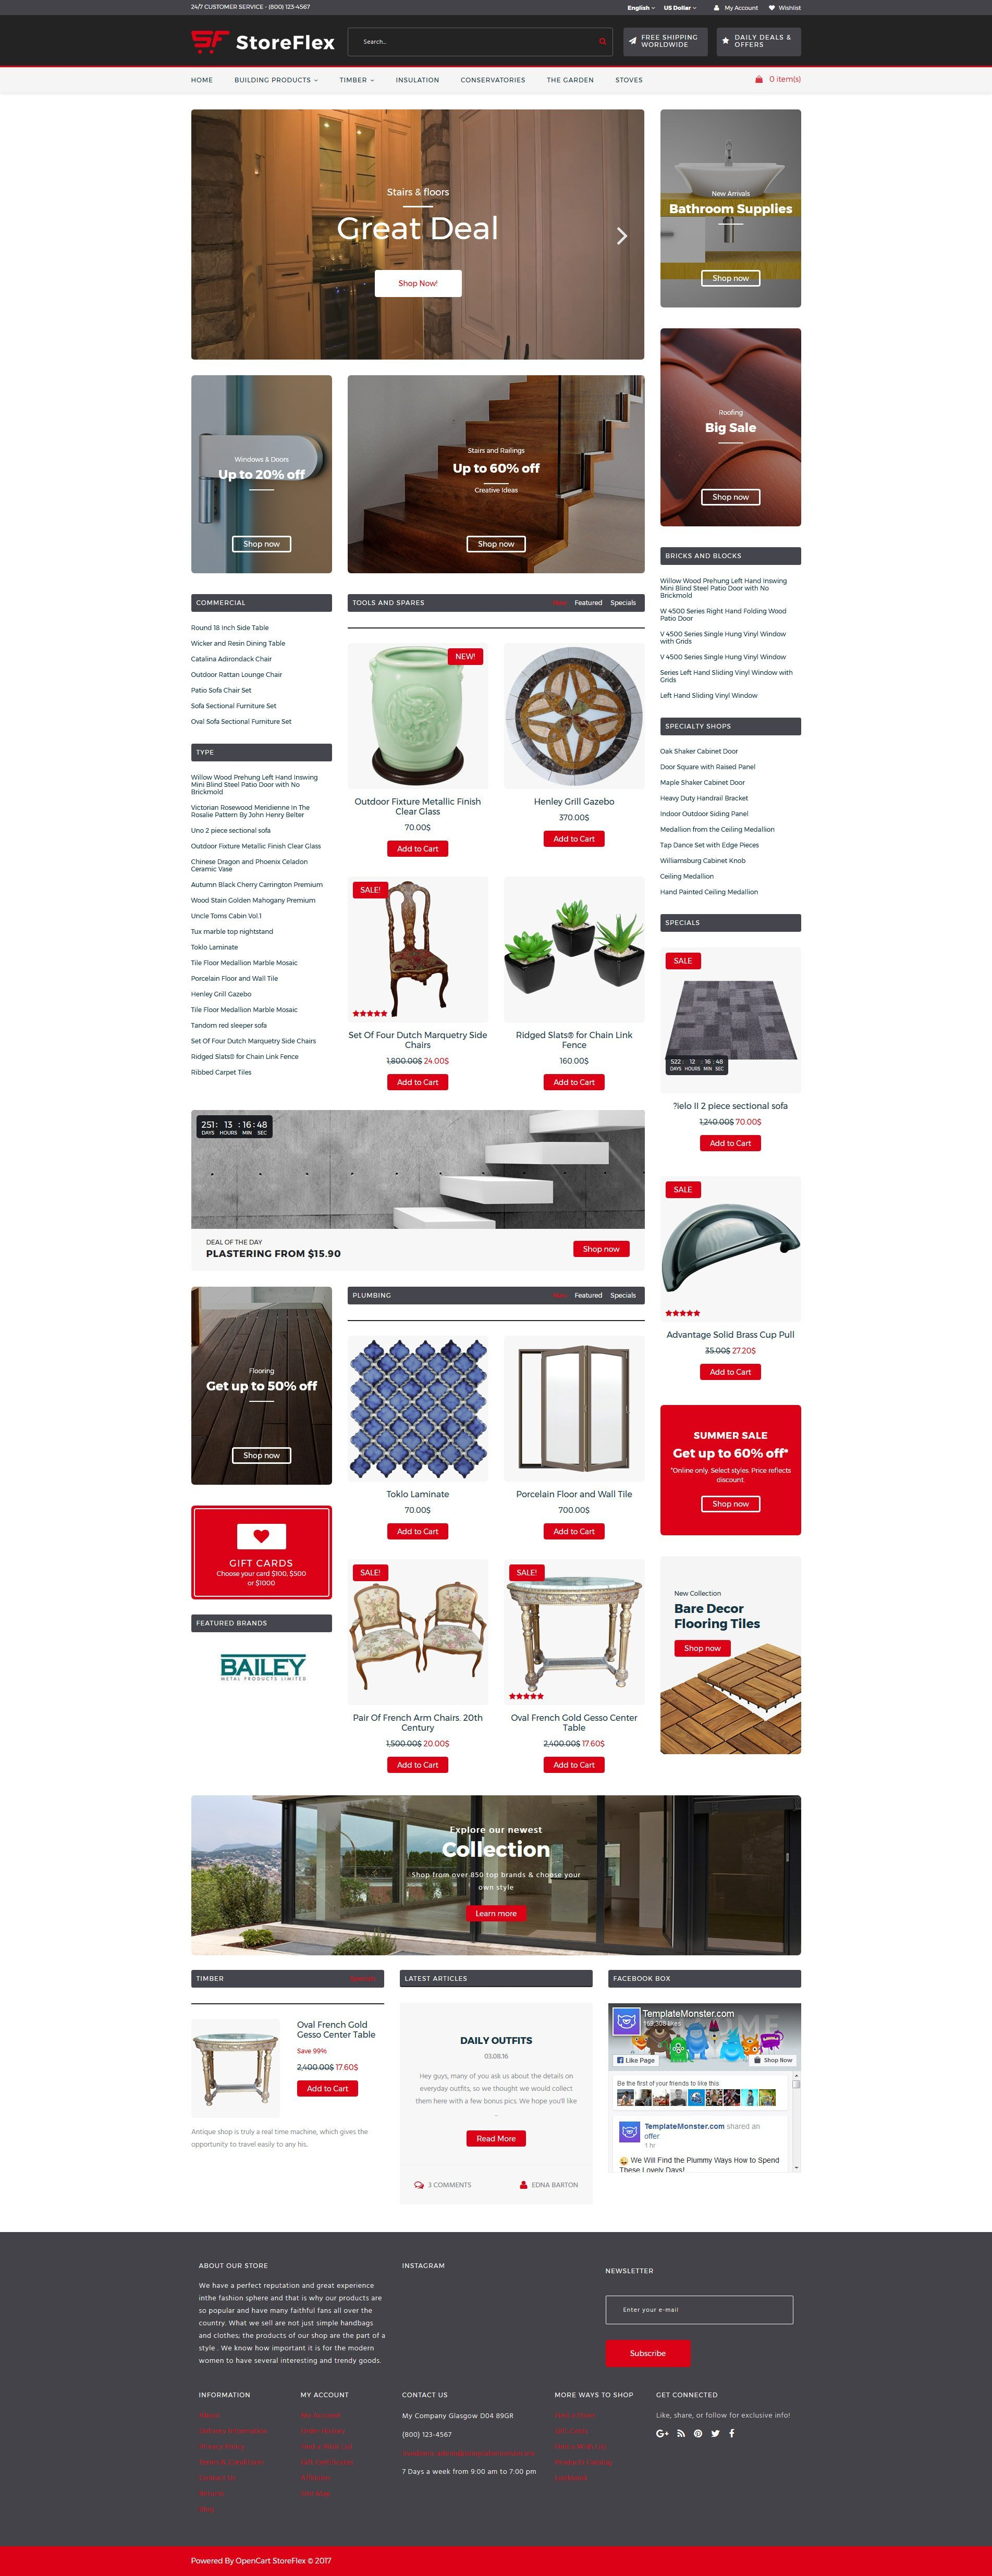 """StoreFlex - Building Materials Responsive"" 响应式OpenCart模板 #63567 - 截图"